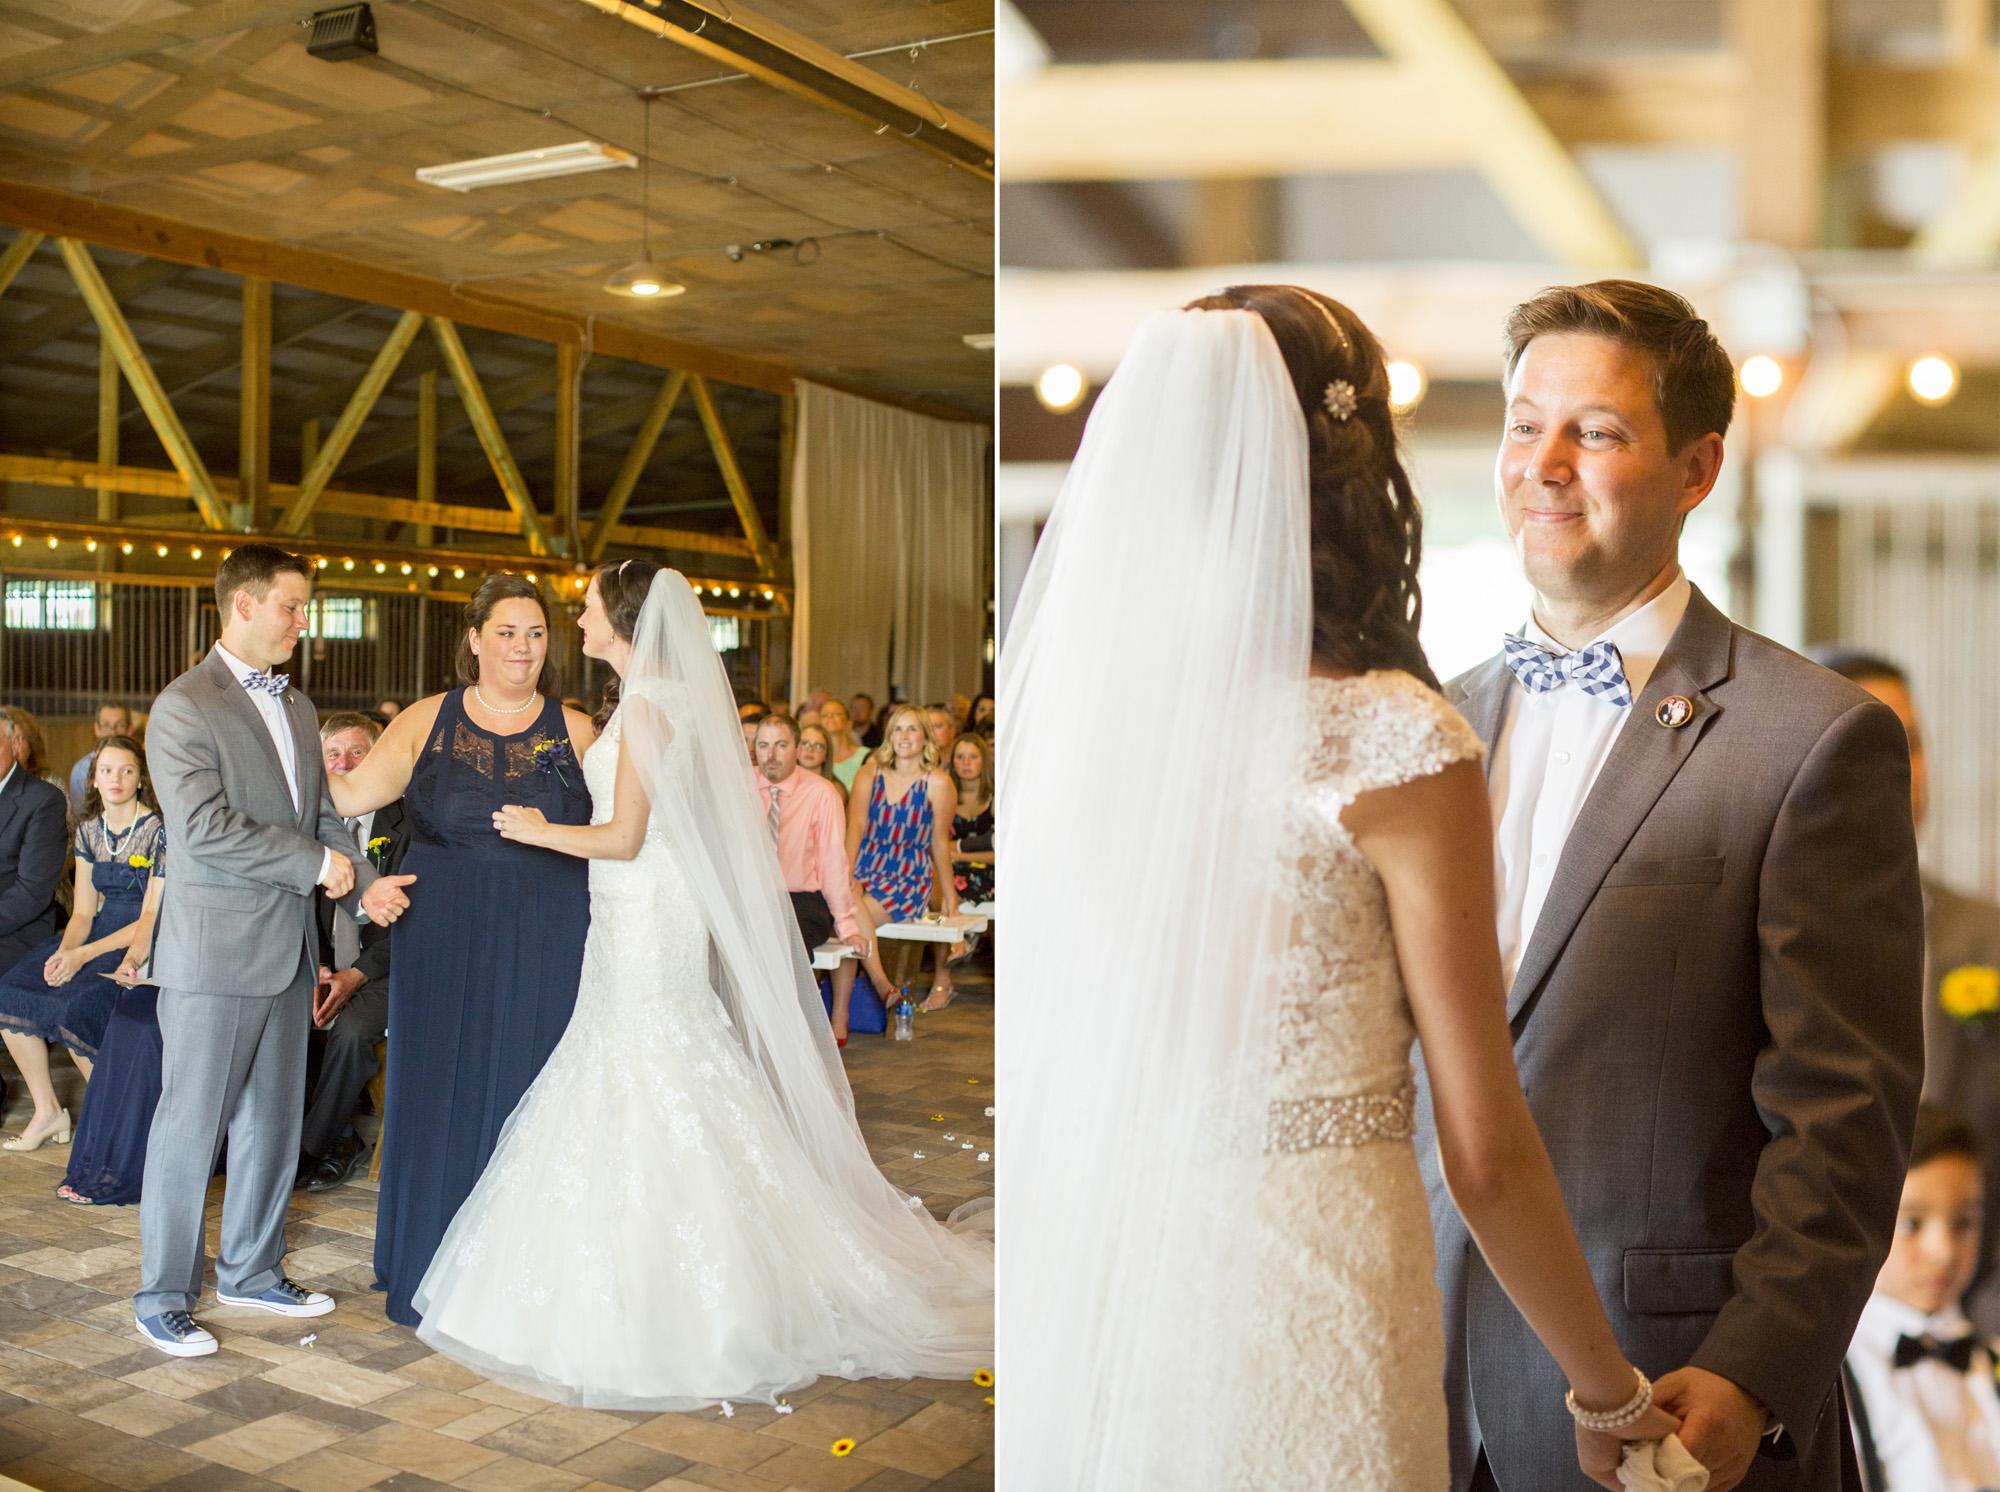 Seriously_Sabrina_Photography_Bowling_Green_Kentucky_Highland_Stables_Wedding_Wolff93.jpg